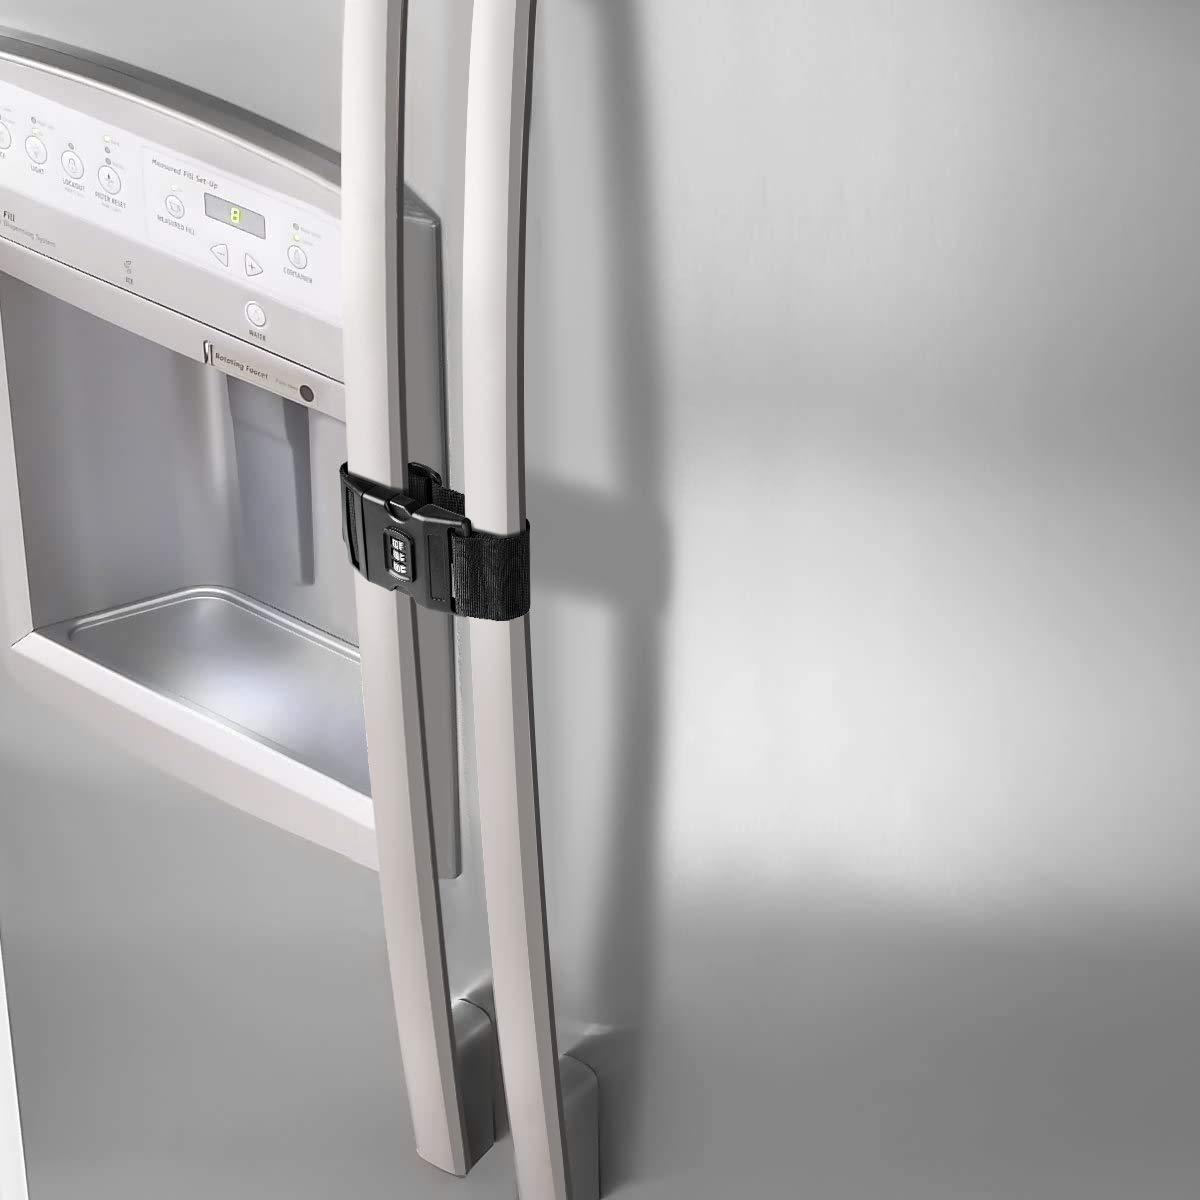 Soaos Fridge Freezer Refrigerator Cabinet Latch 2 Packs Lock National uniform free shipping latest